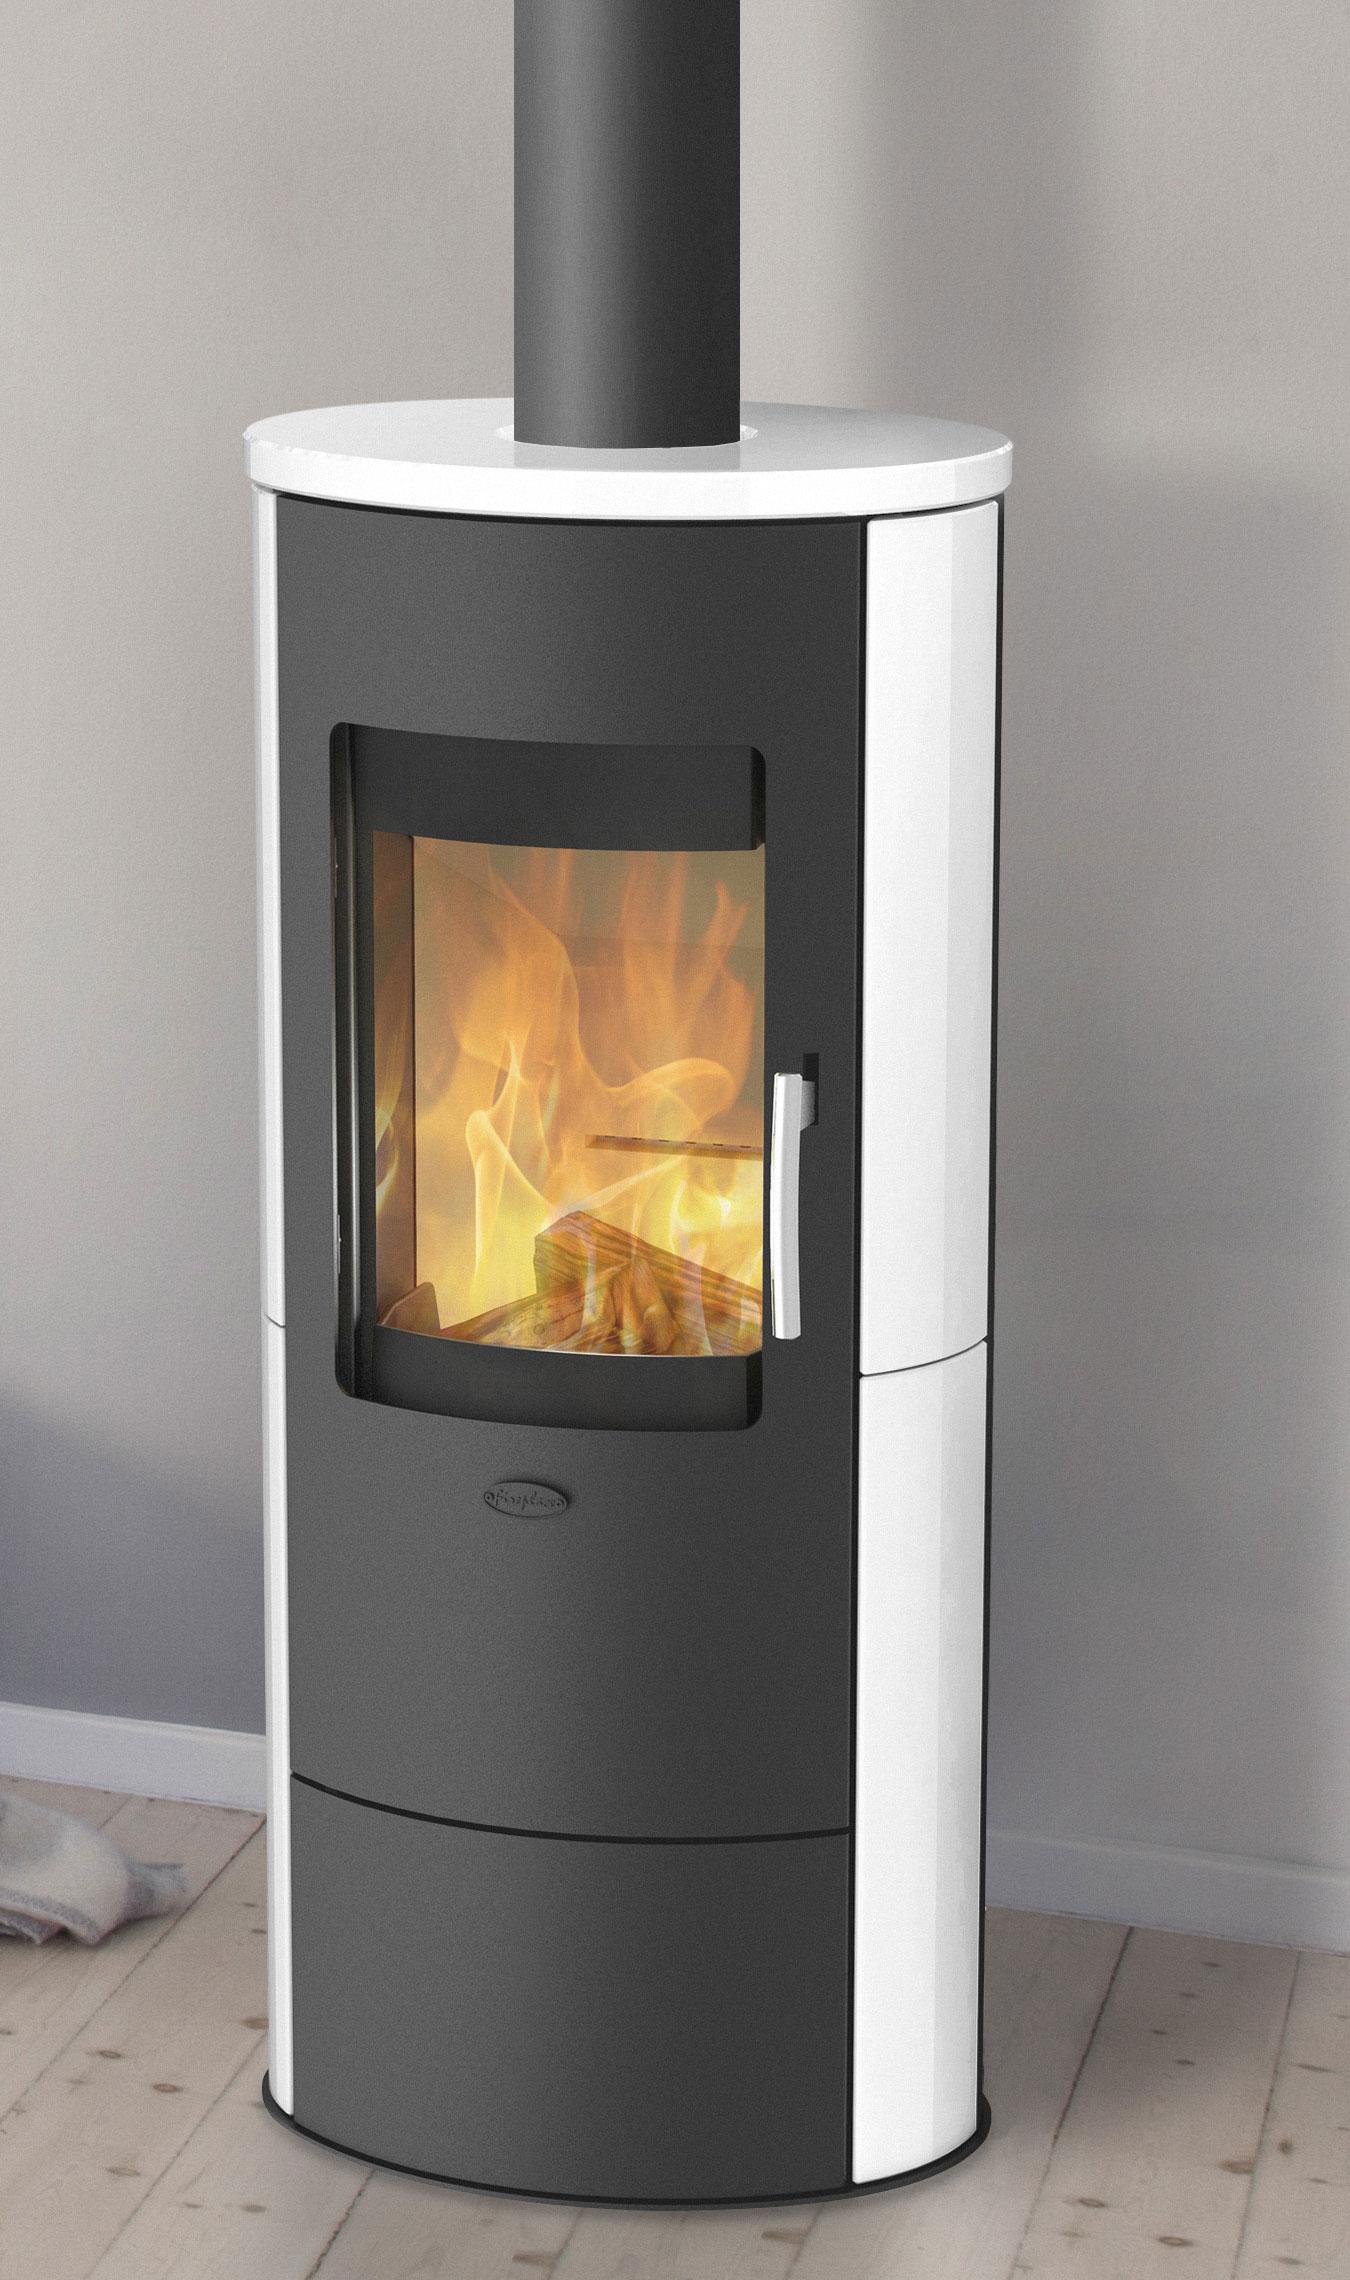 kaminofen dauerbrandofen fireplace roma keramik. Black Bedroom Furniture Sets. Home Design Ideas